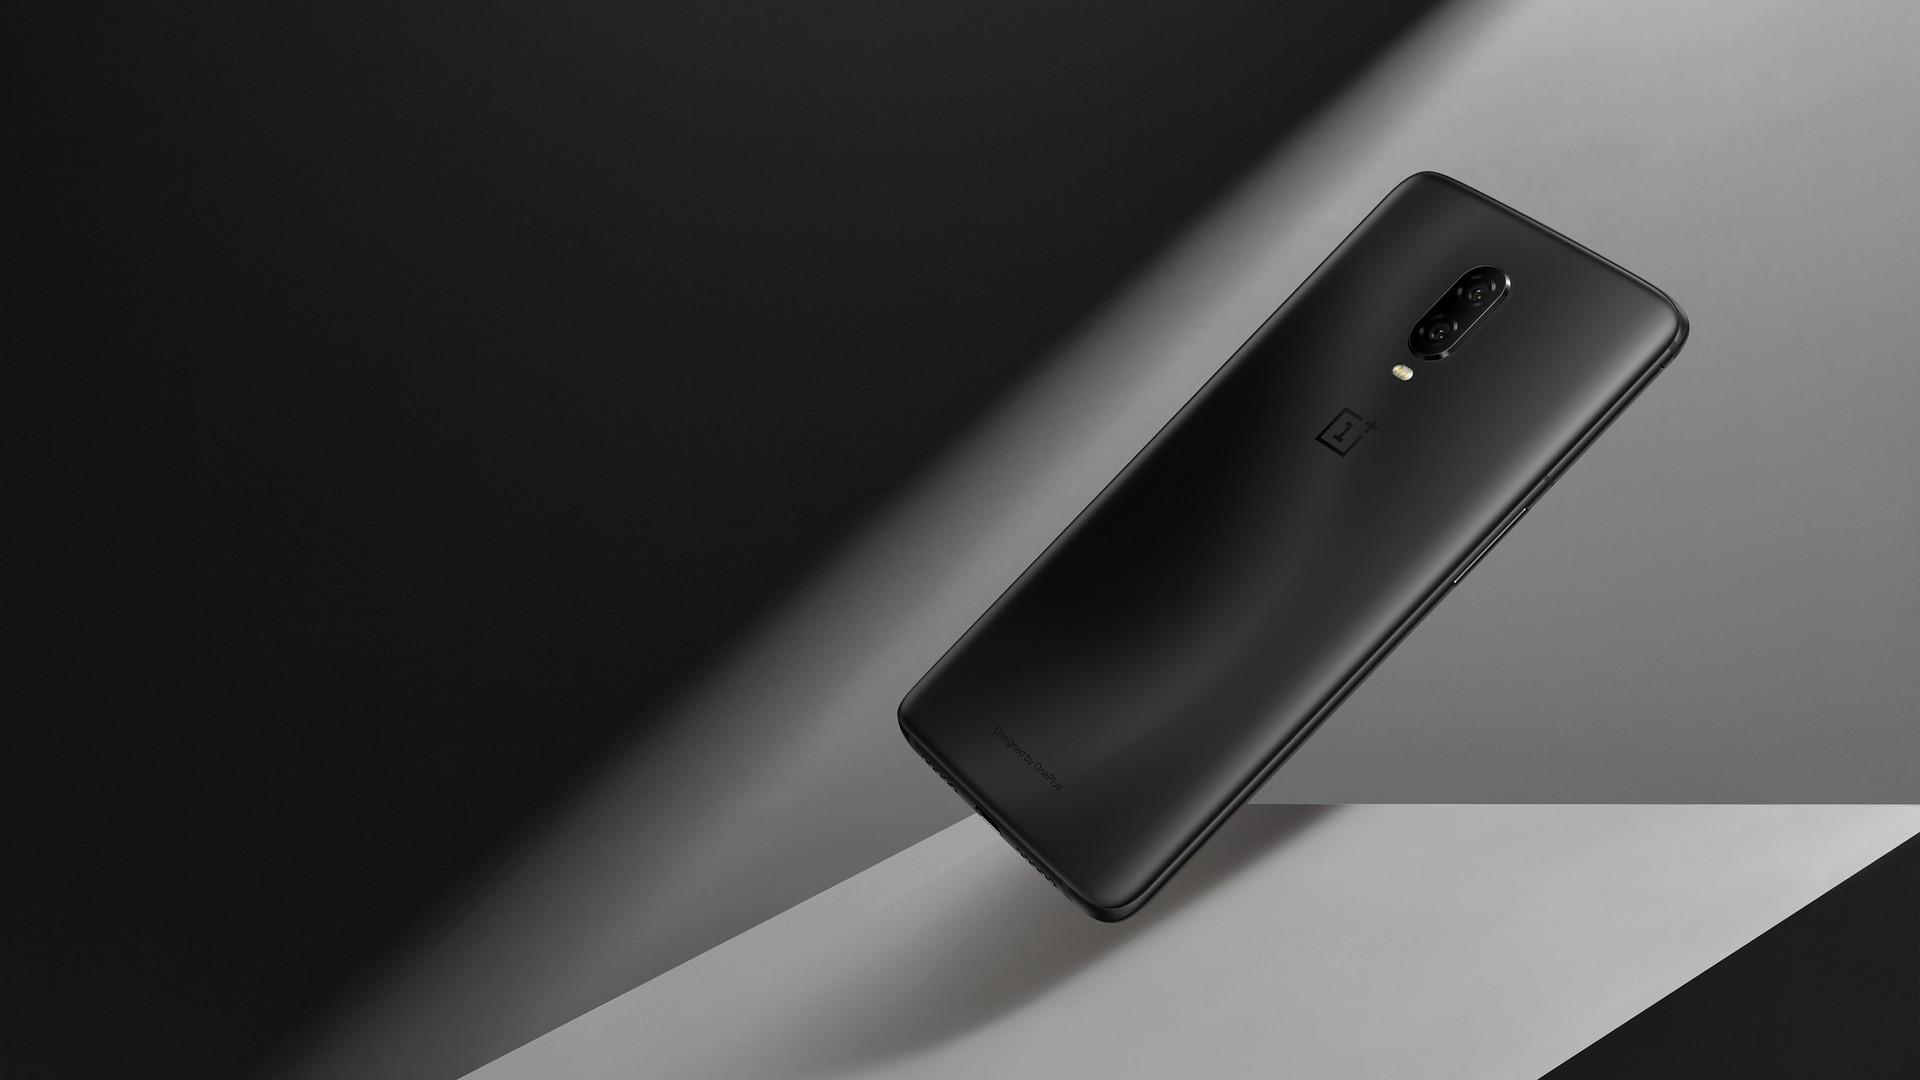 OnePlus 6T black color